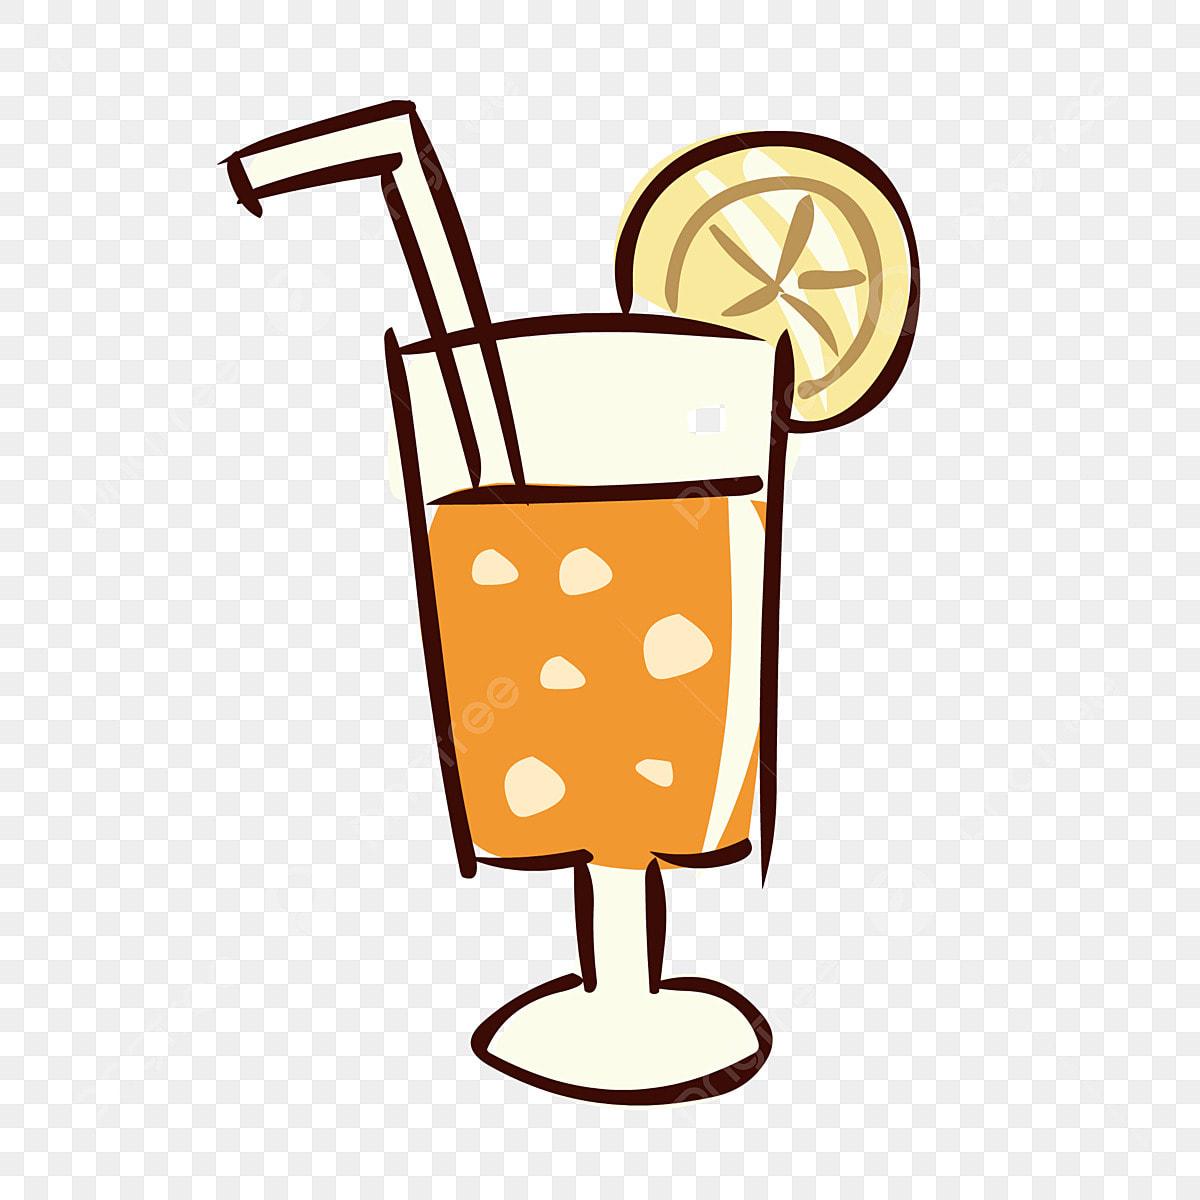 Unsur Makanan Tangan Ditarik Jus Minuman Kartun Comel Elemen